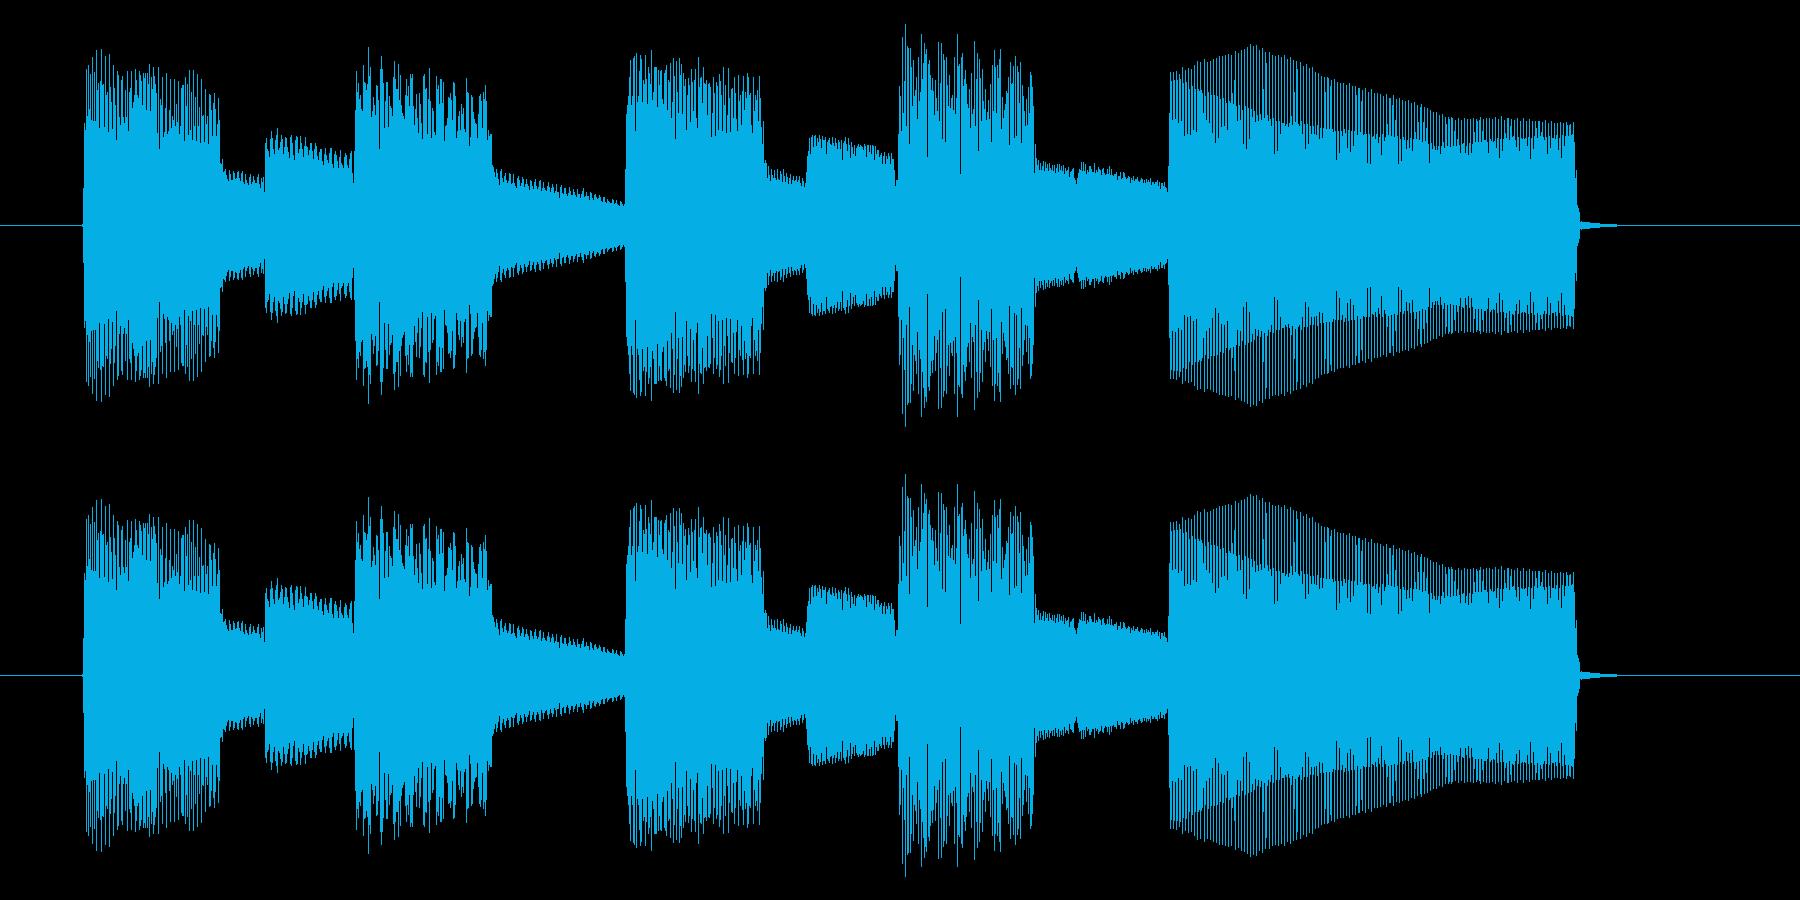 NES スポーツ A03-2(クリア2)の再生済みの波形